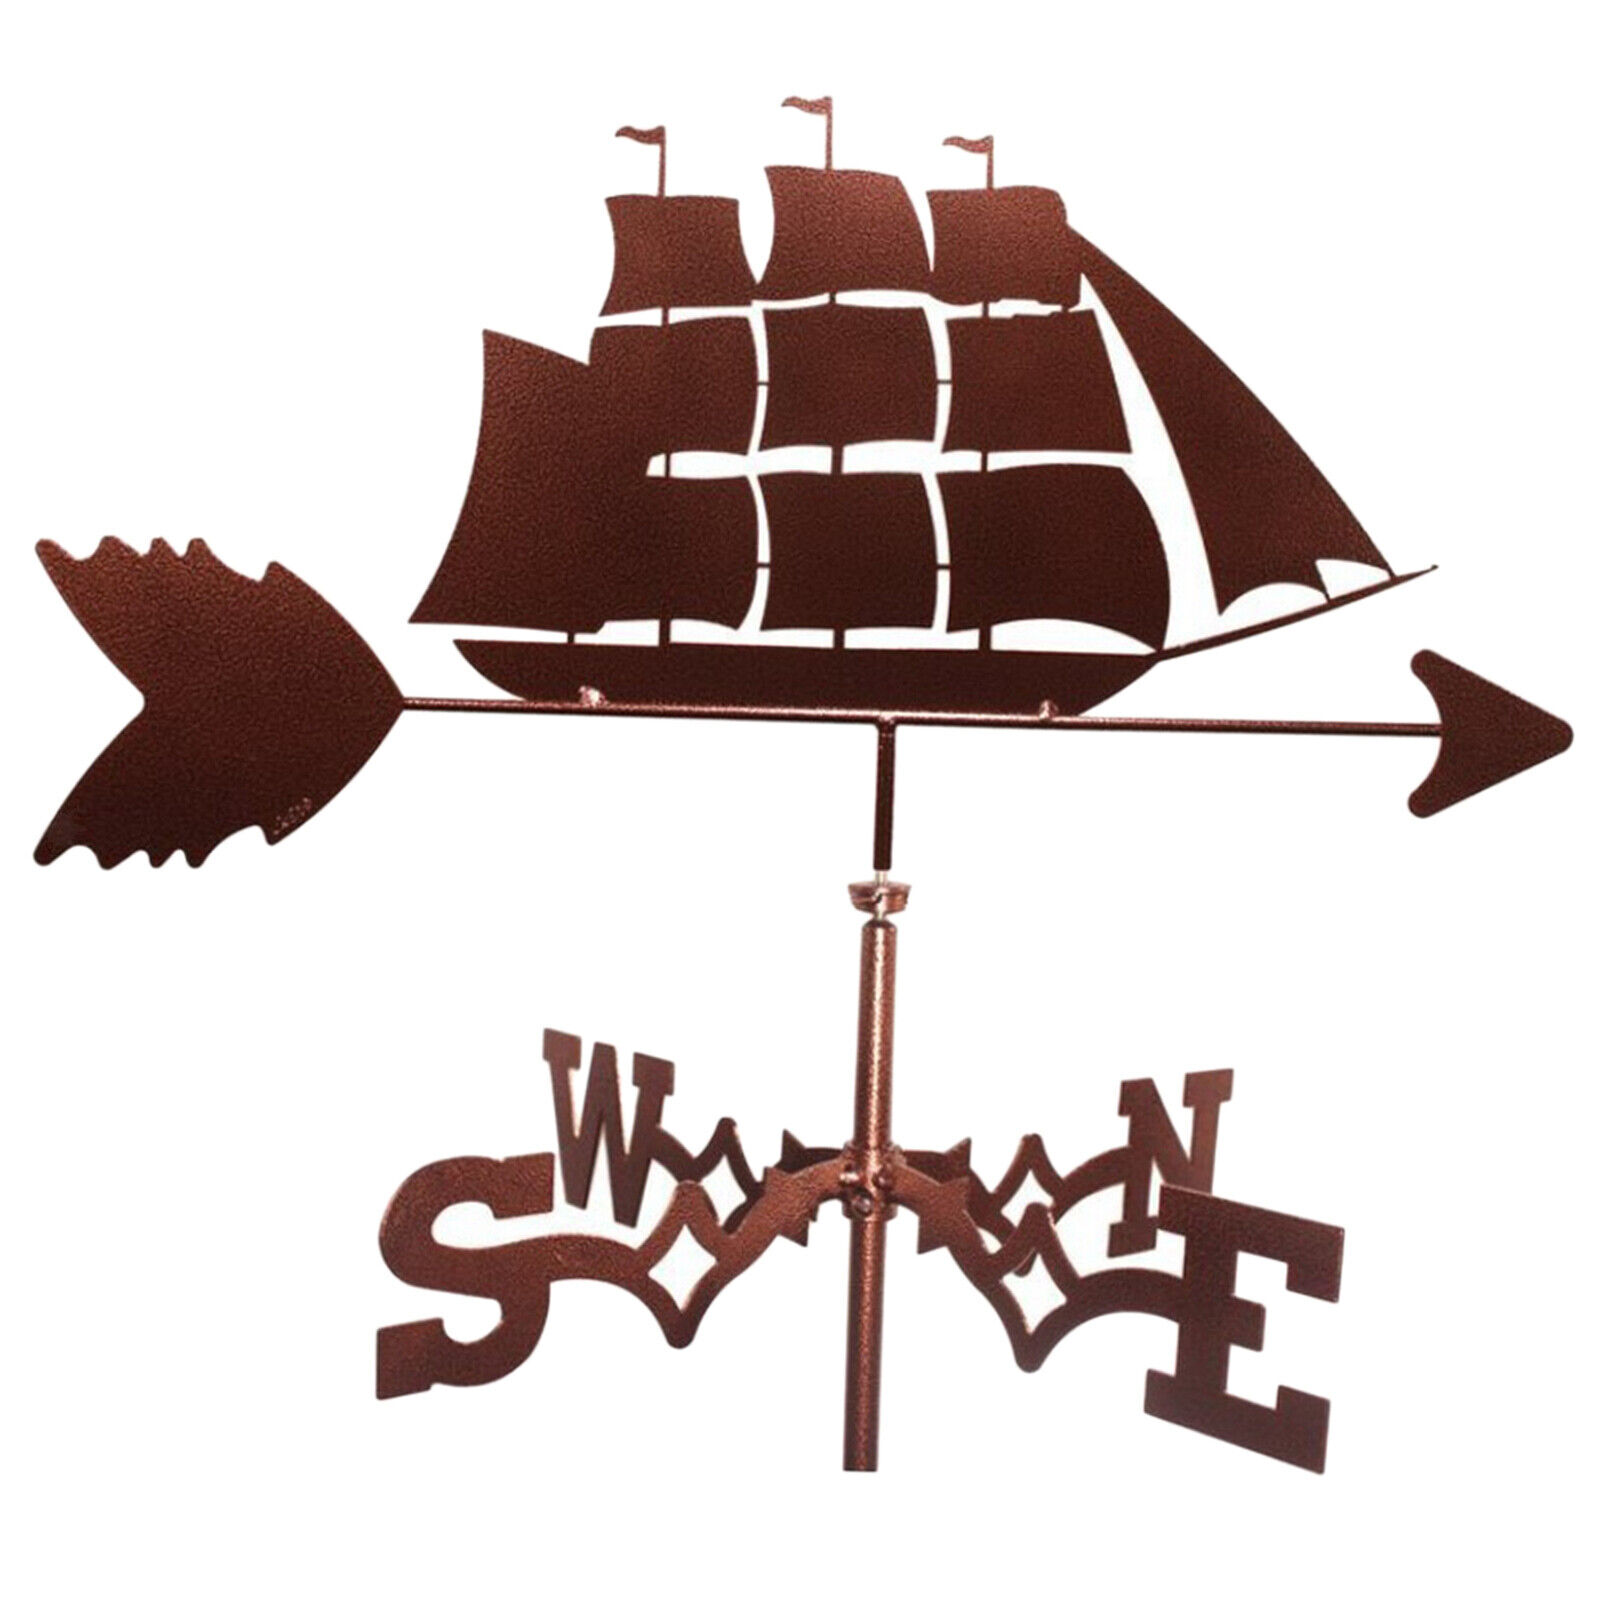 Decorative Stainless Steel Sailboat Weathervane Weather Vane Stake Ornament